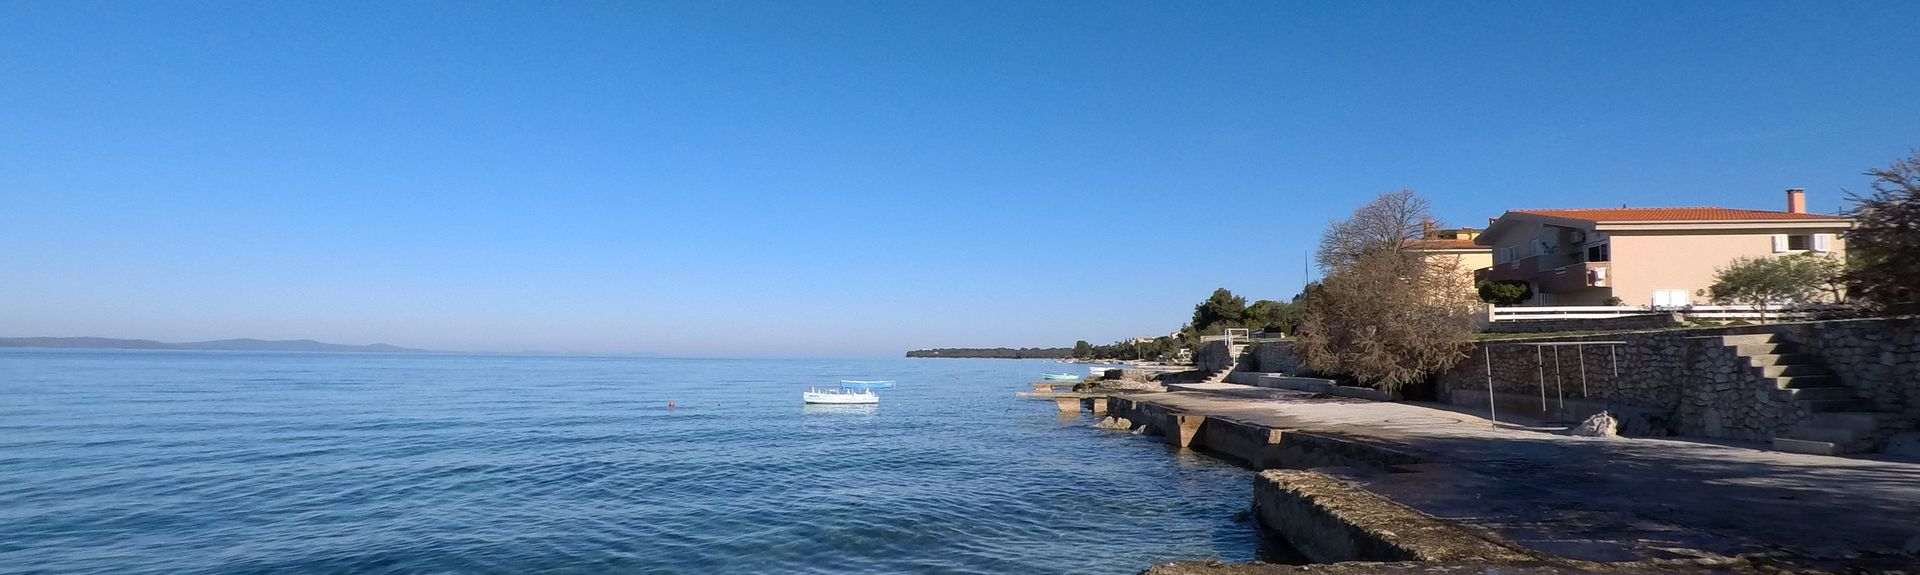 Plaża Ninska Laguna, Nin, Żupania zadarska, Chorwacja